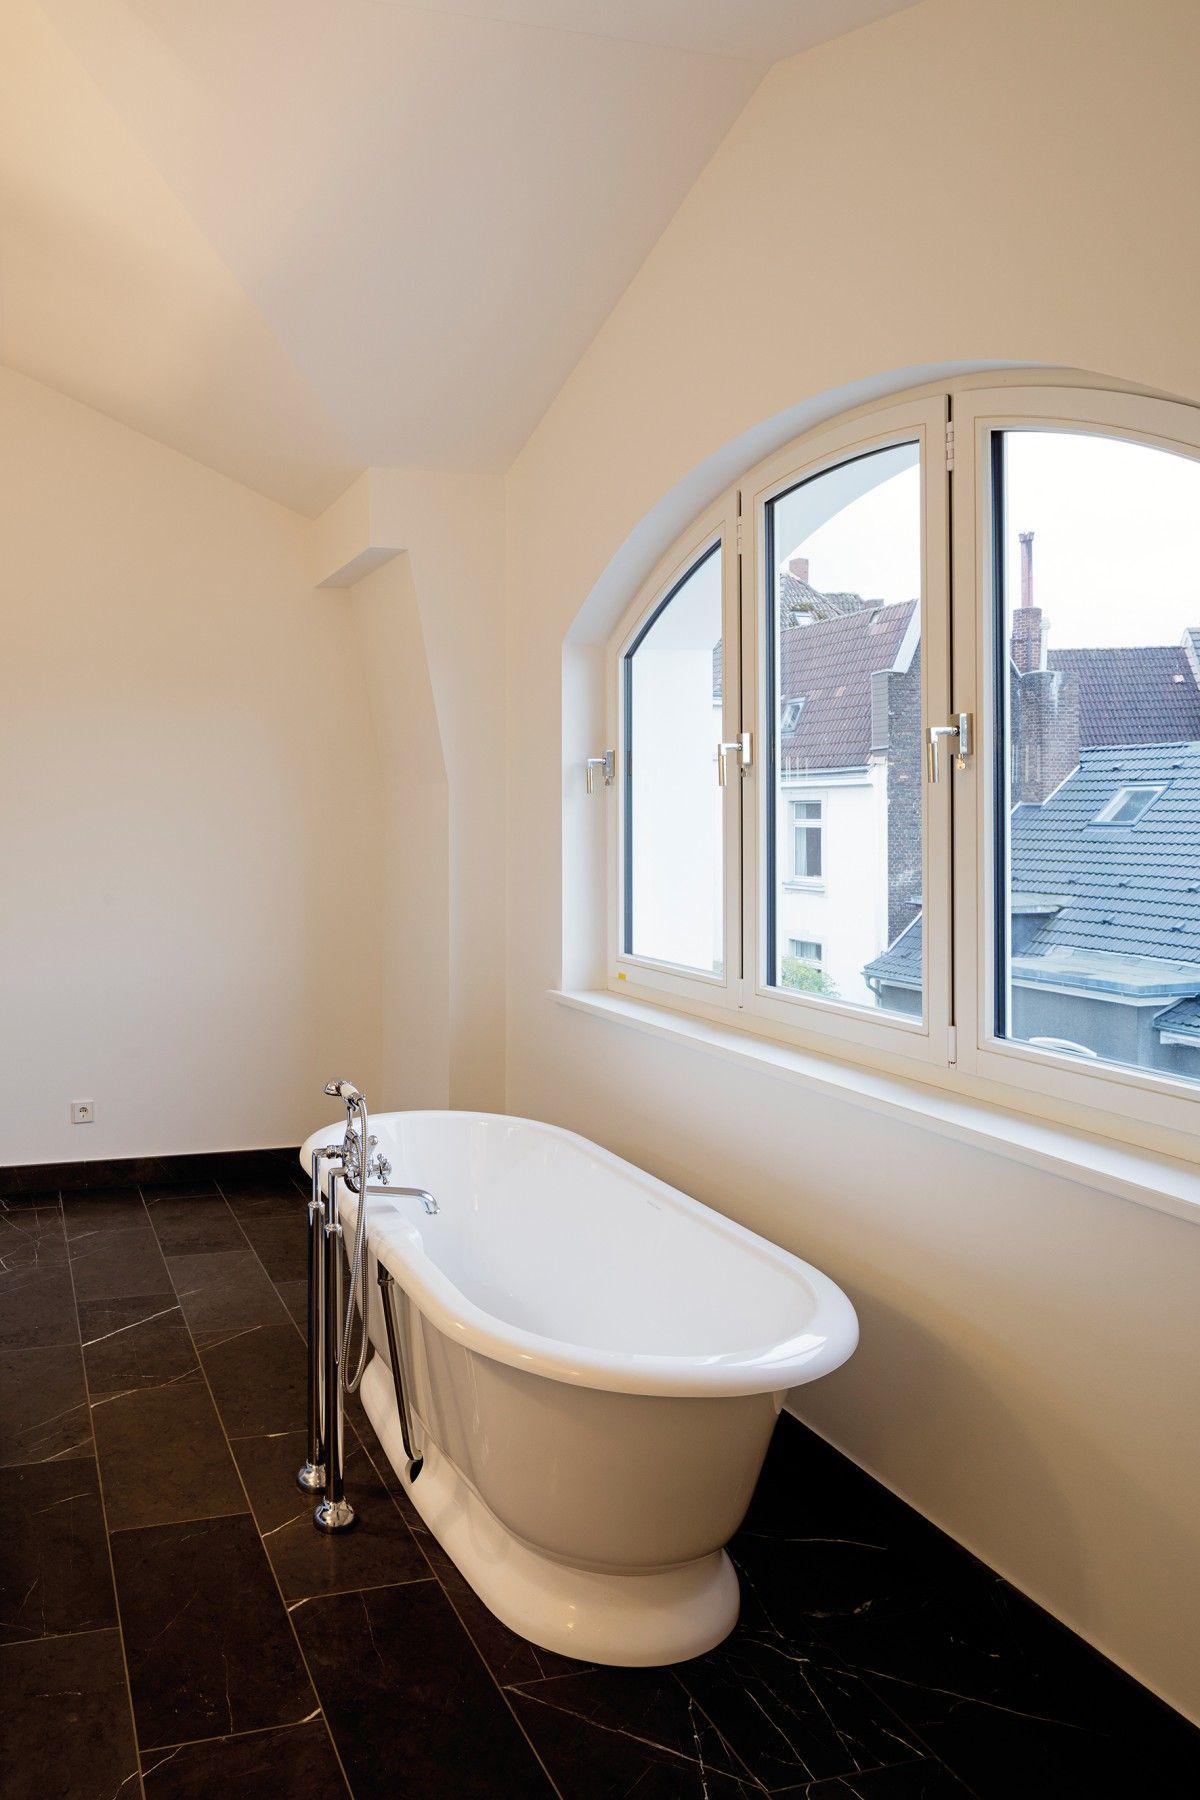 freistehende badewanne vor dem fenster carmenstra e ralf schmitz immobilien badezimmer ralf. Black Bedroom Furniture Sets. Home Design Ideas